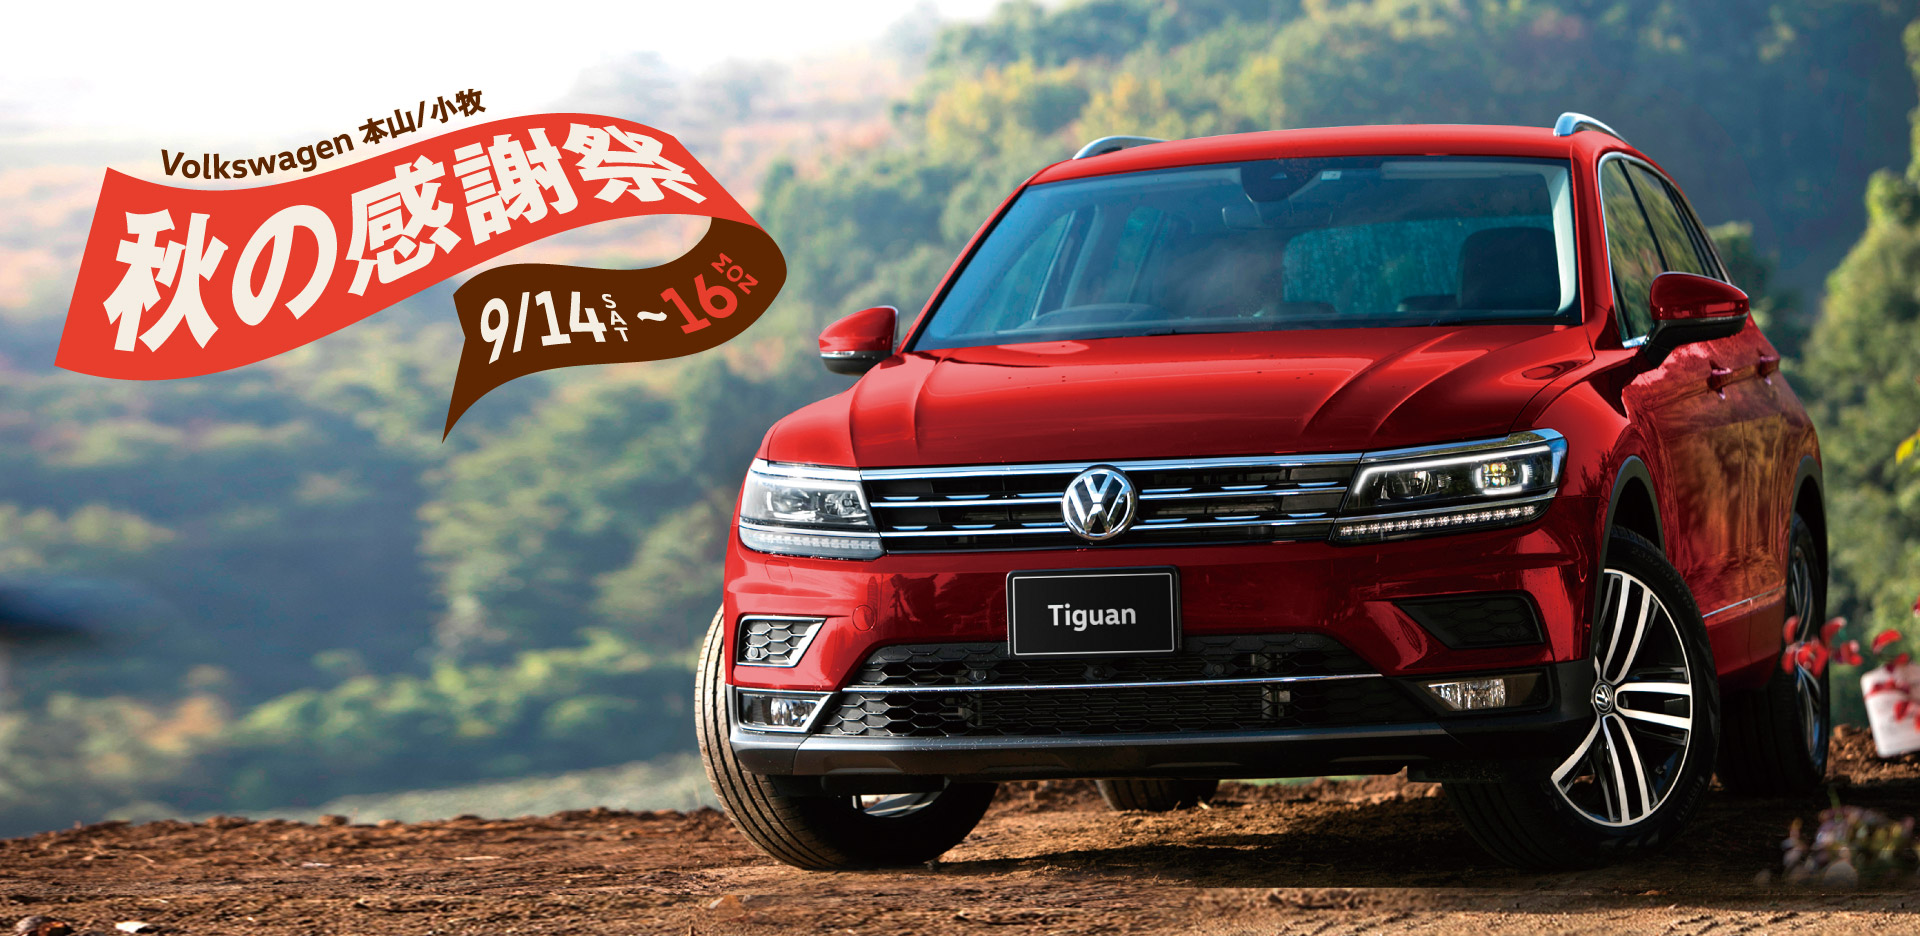 Volkswagen 本山 秋の感謝祭